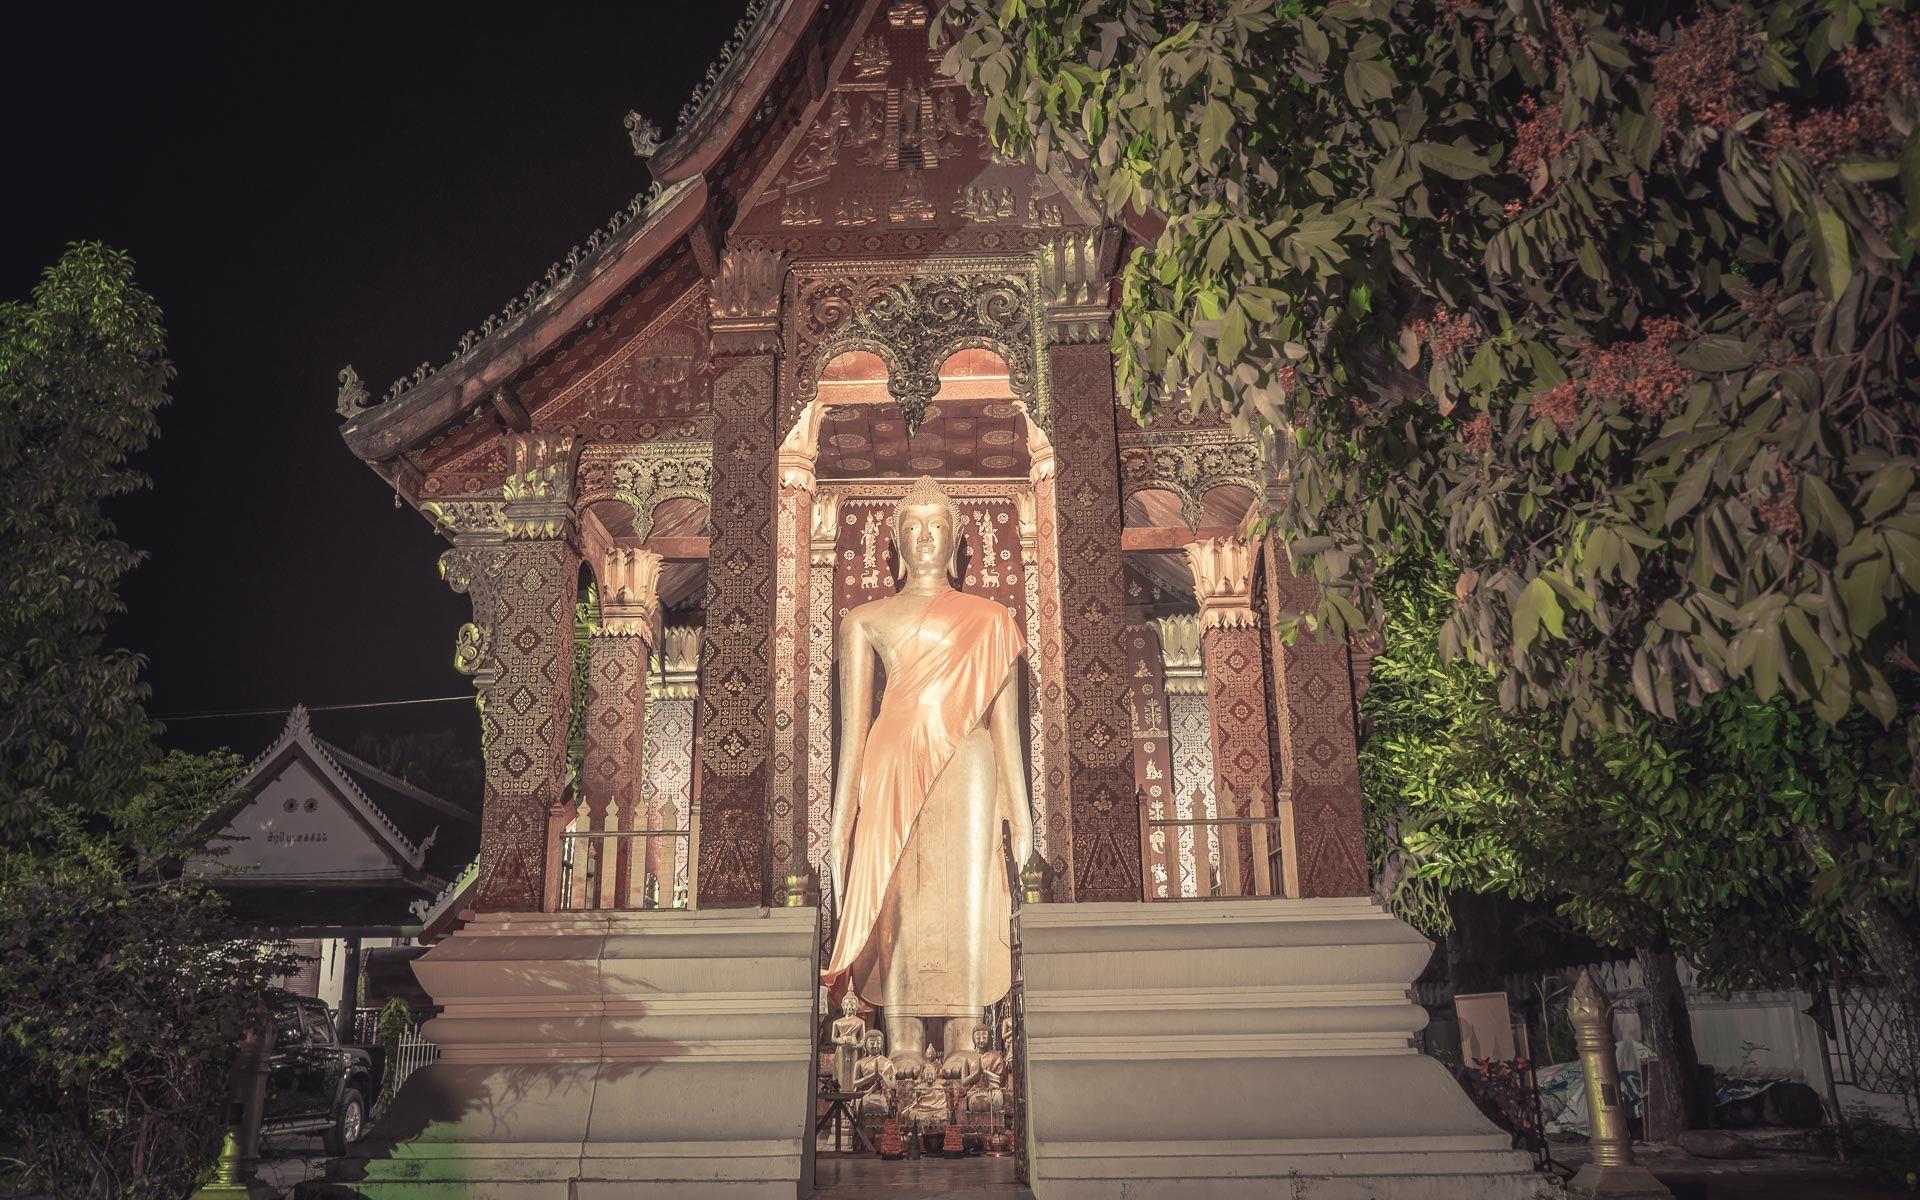 Lesvoyageuses-voyage-laos-luang-prabang-ceremonie-offrandes-1